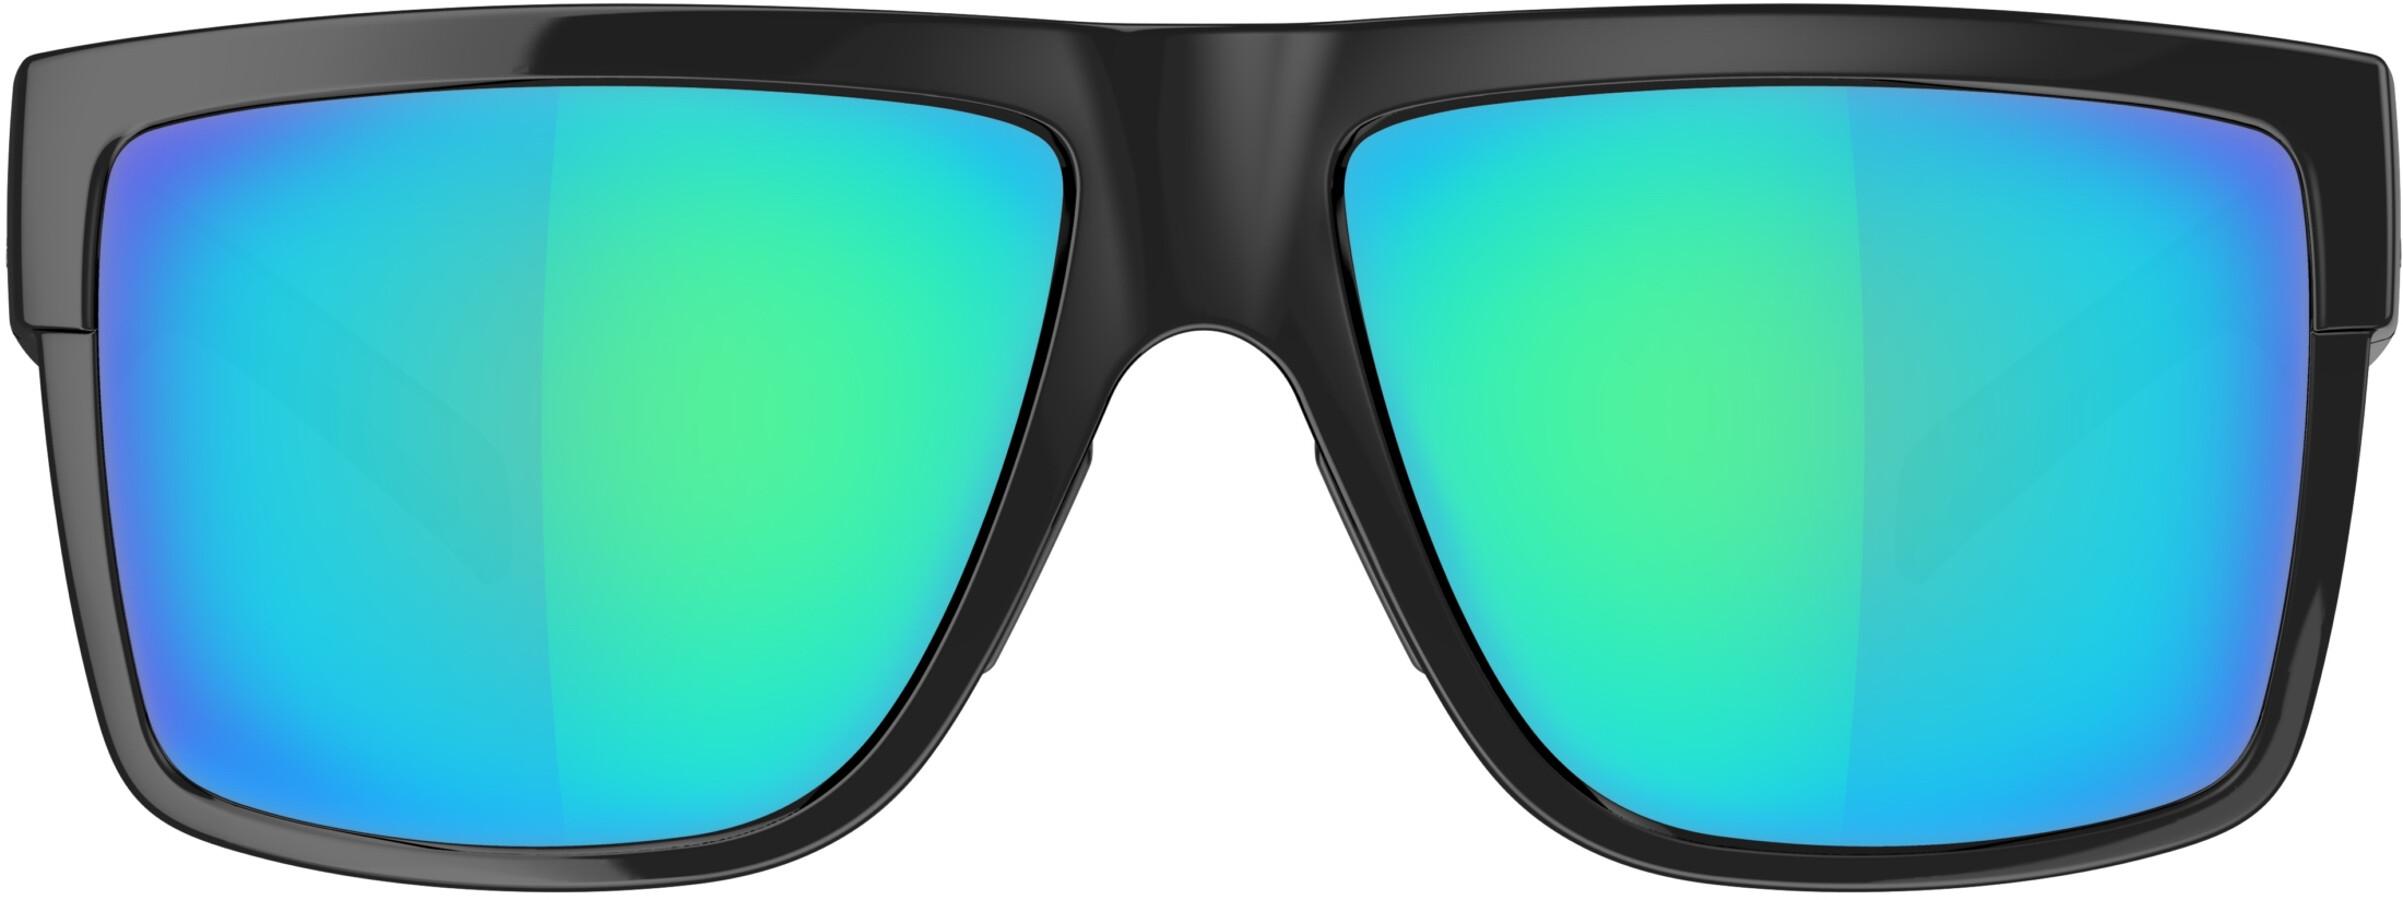 5019cdb3804a2 adidas 3 Matic Bike Glasses blue black at Addnature.co.uk